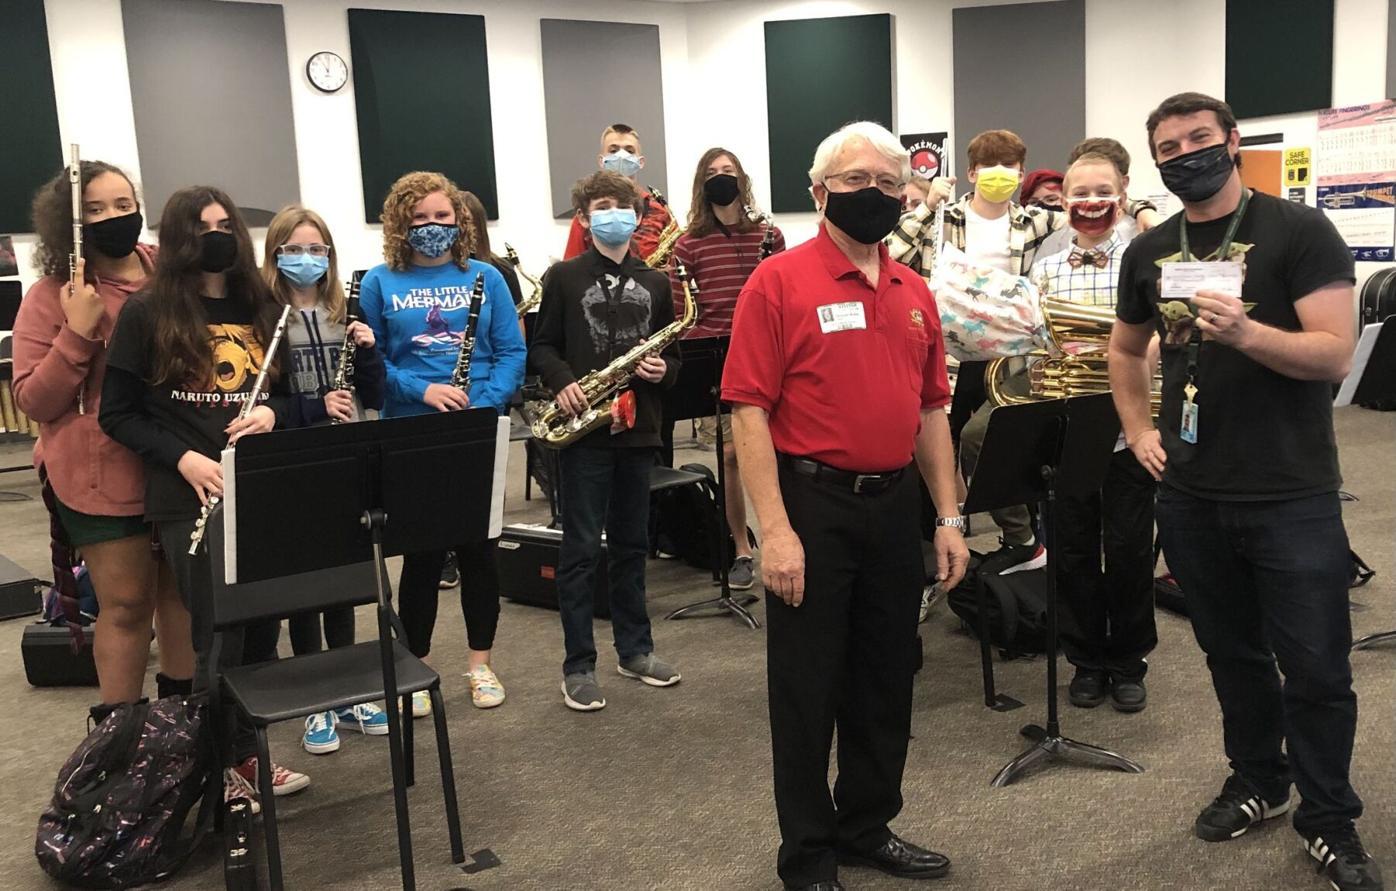 Venice High School band director receives xhwxk